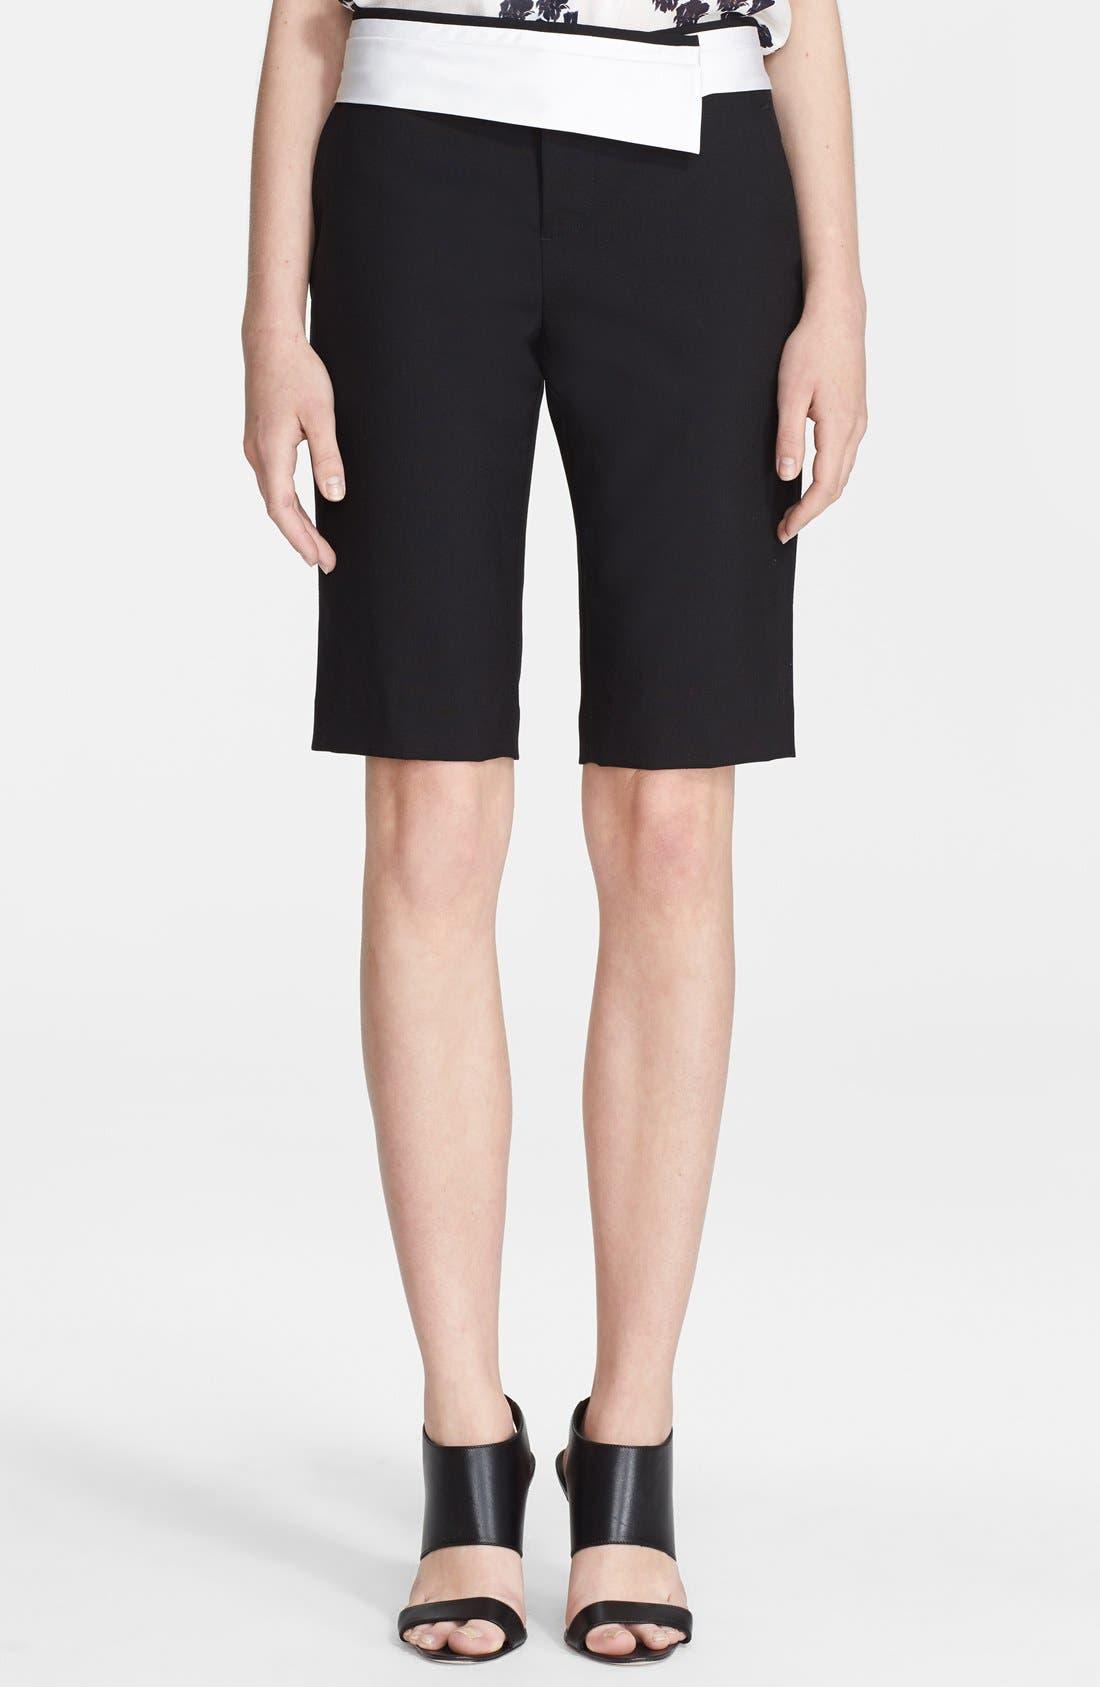 Alternate Image 1 Selected - A.L.C. 'Towner' Bermuda Shorts